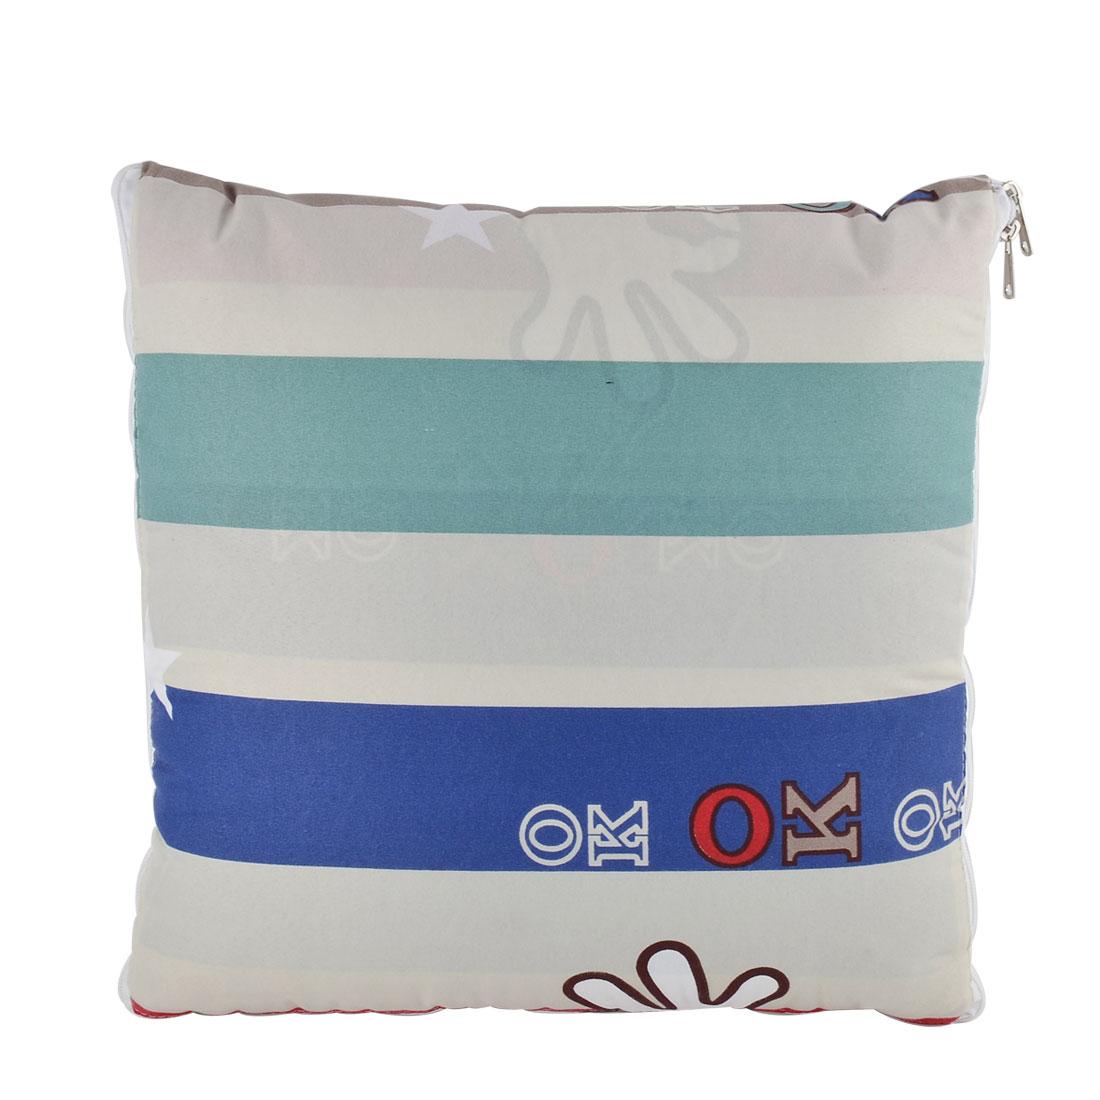 Home Office Car Cotton Blends Stripe Print Zippered Pillow Cushion Quilt Dual 40 x 40cm